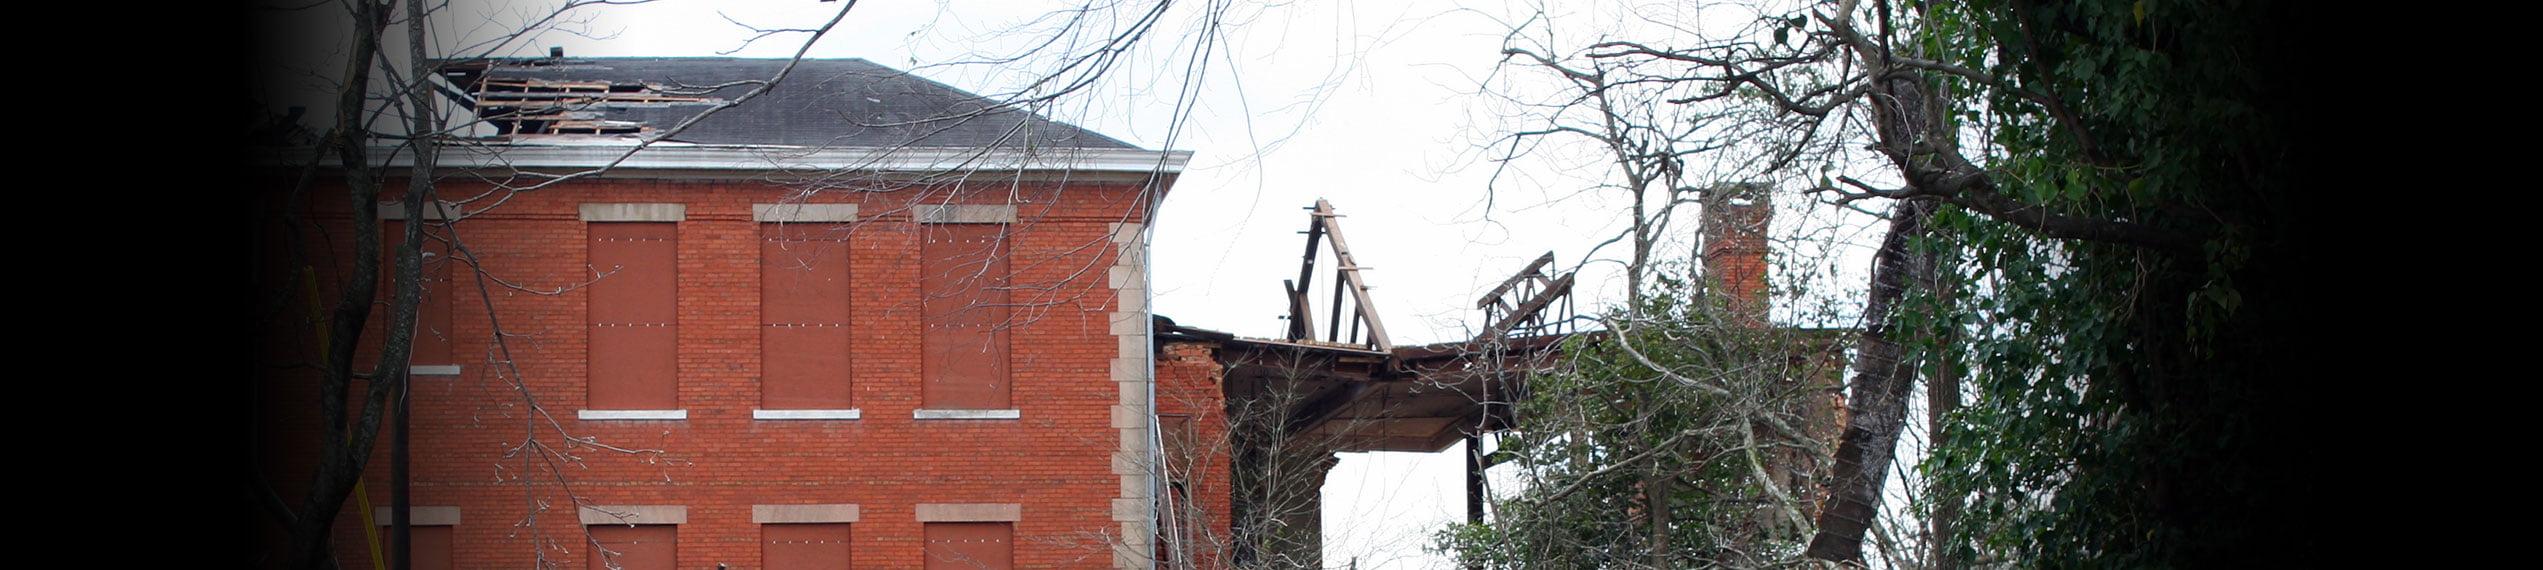 Wind & Storm Damage Repairs in Paul Davis Emergency Services of Southwest Oklahoma City, OK